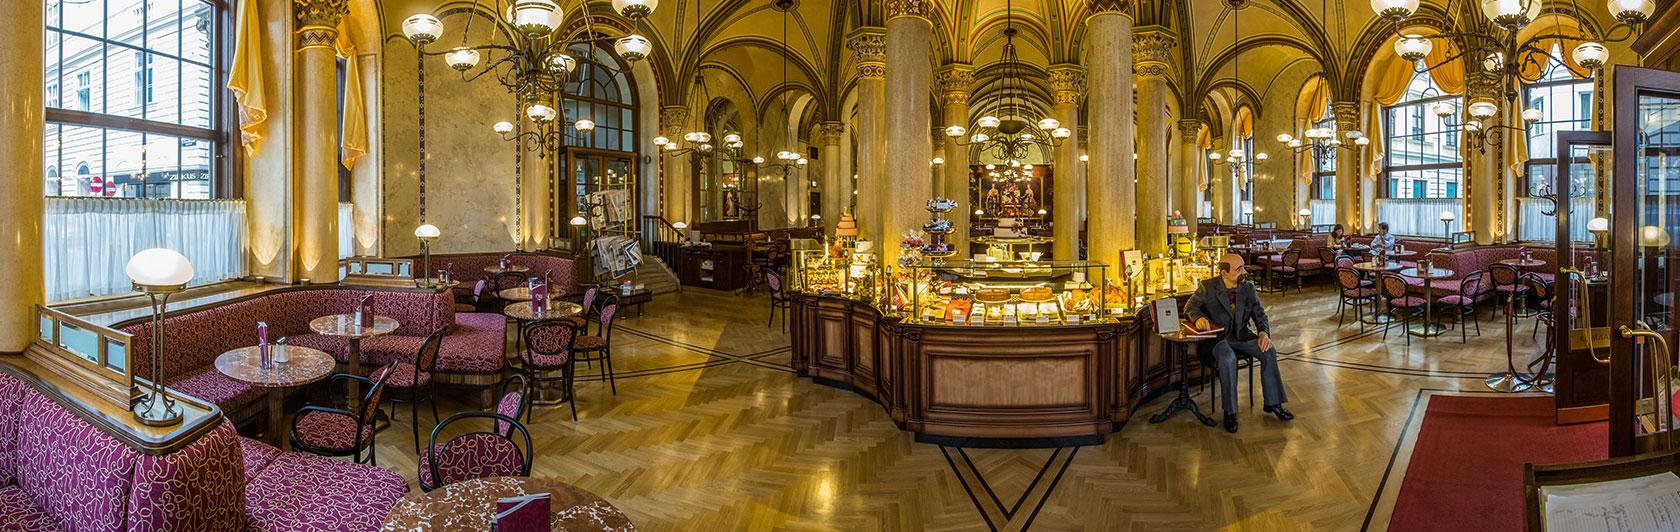 Wien Central Cafe